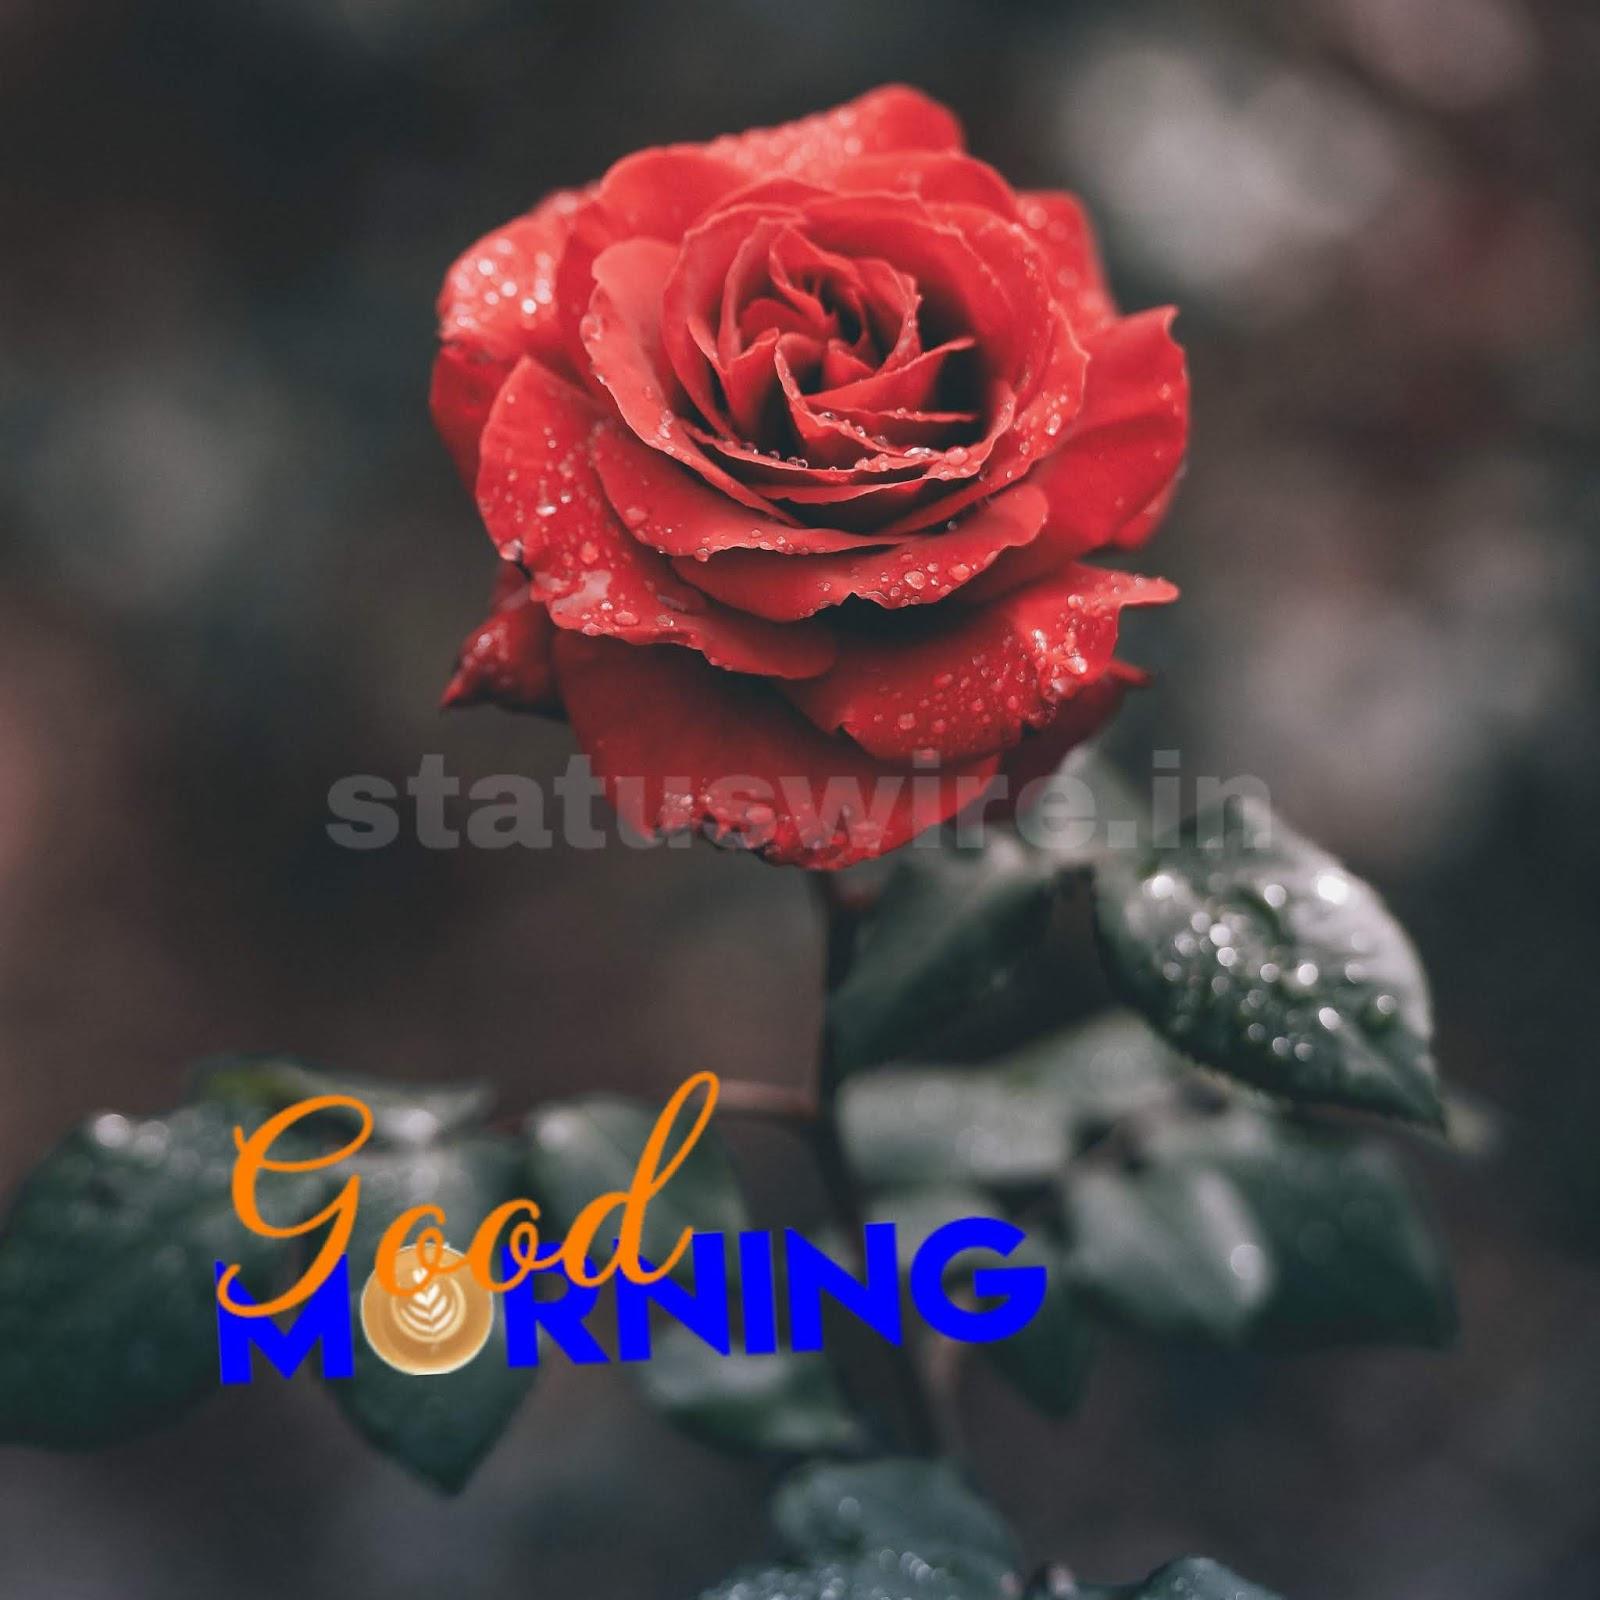 Good Morning Red Rose Hd Wallpaper - Insta Dp Of Flowers - HD Wallpaper